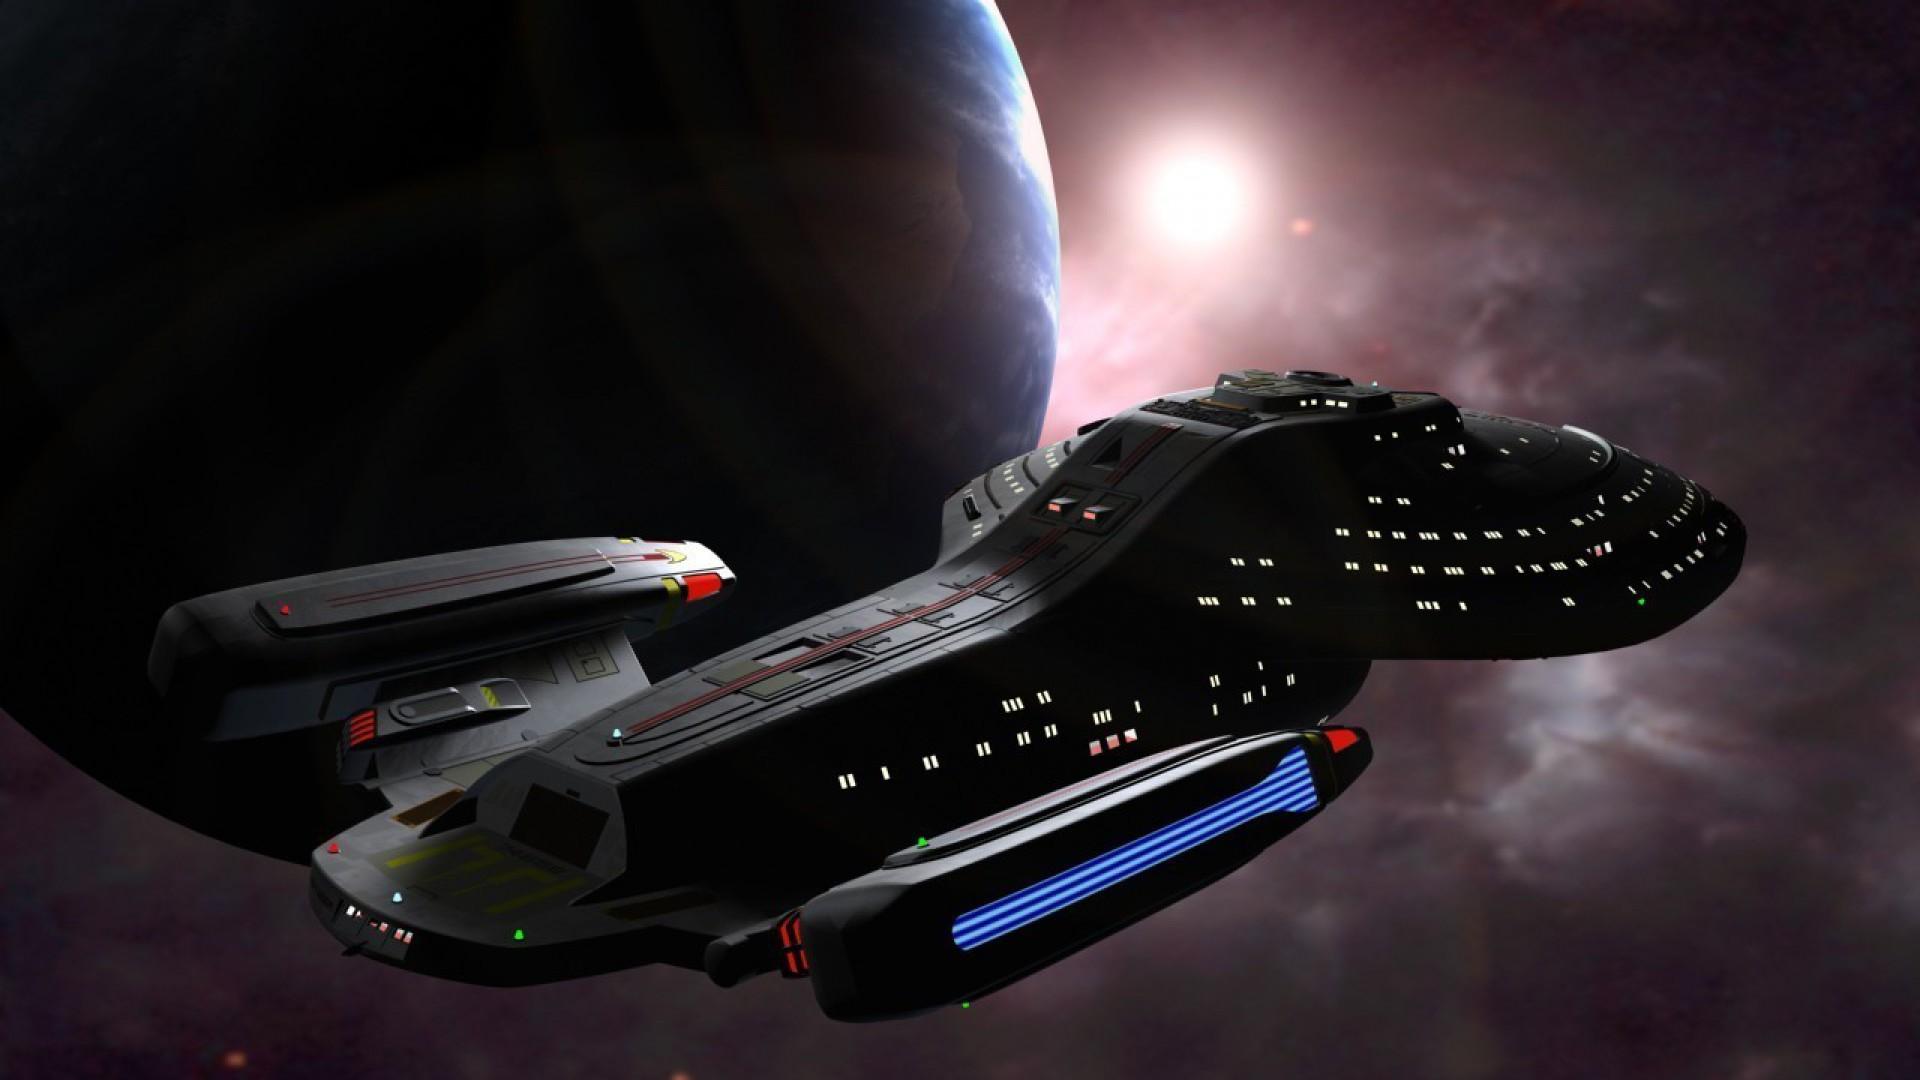 1080P Star Trek Wallpaper